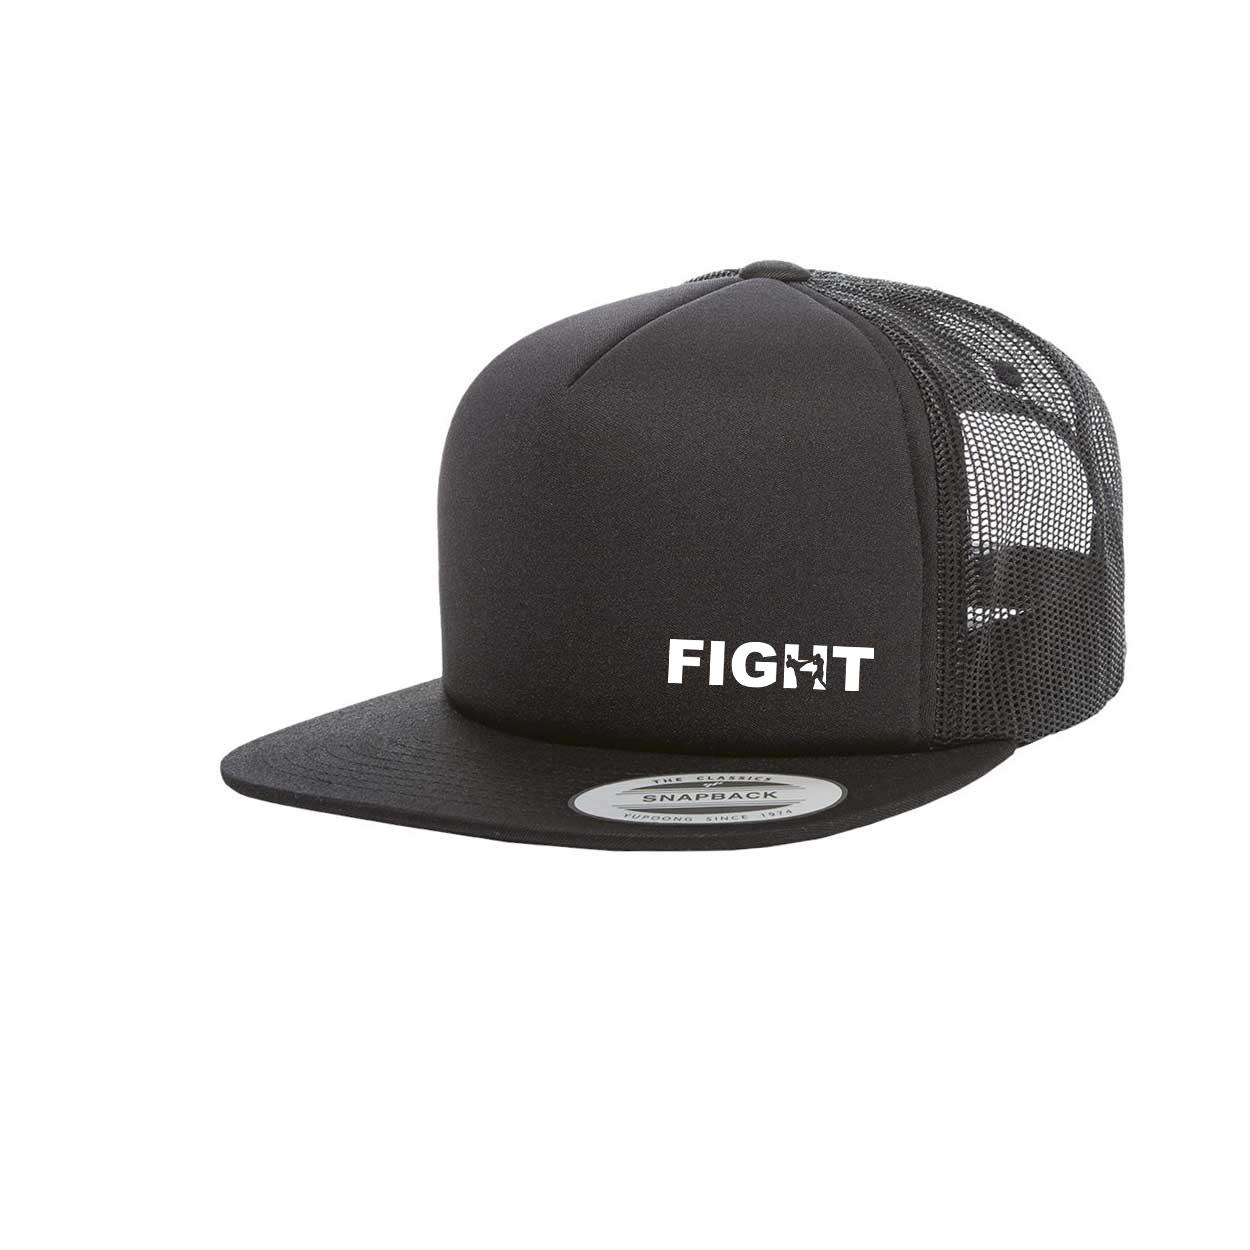 Fight Kick Logo Night Out Premium Foam Flat Brim Snapback Hat Black (White Logo)